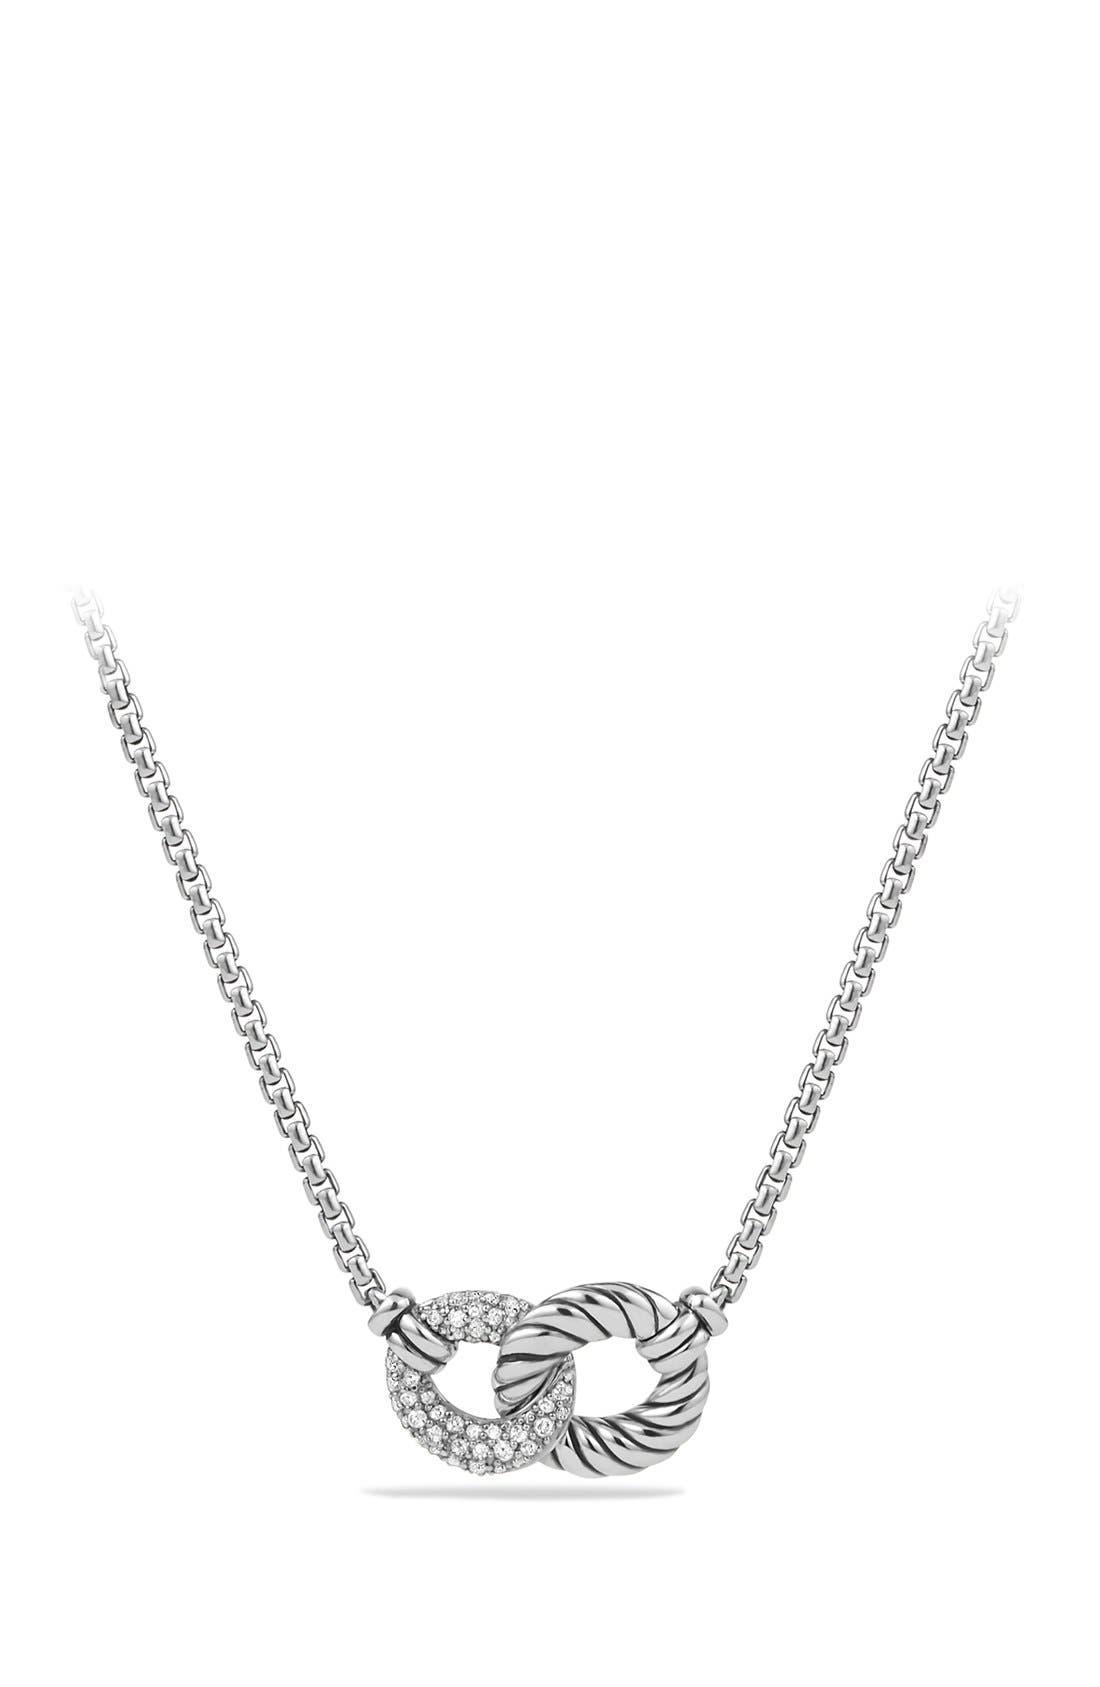 david yurman necklace with diamonds